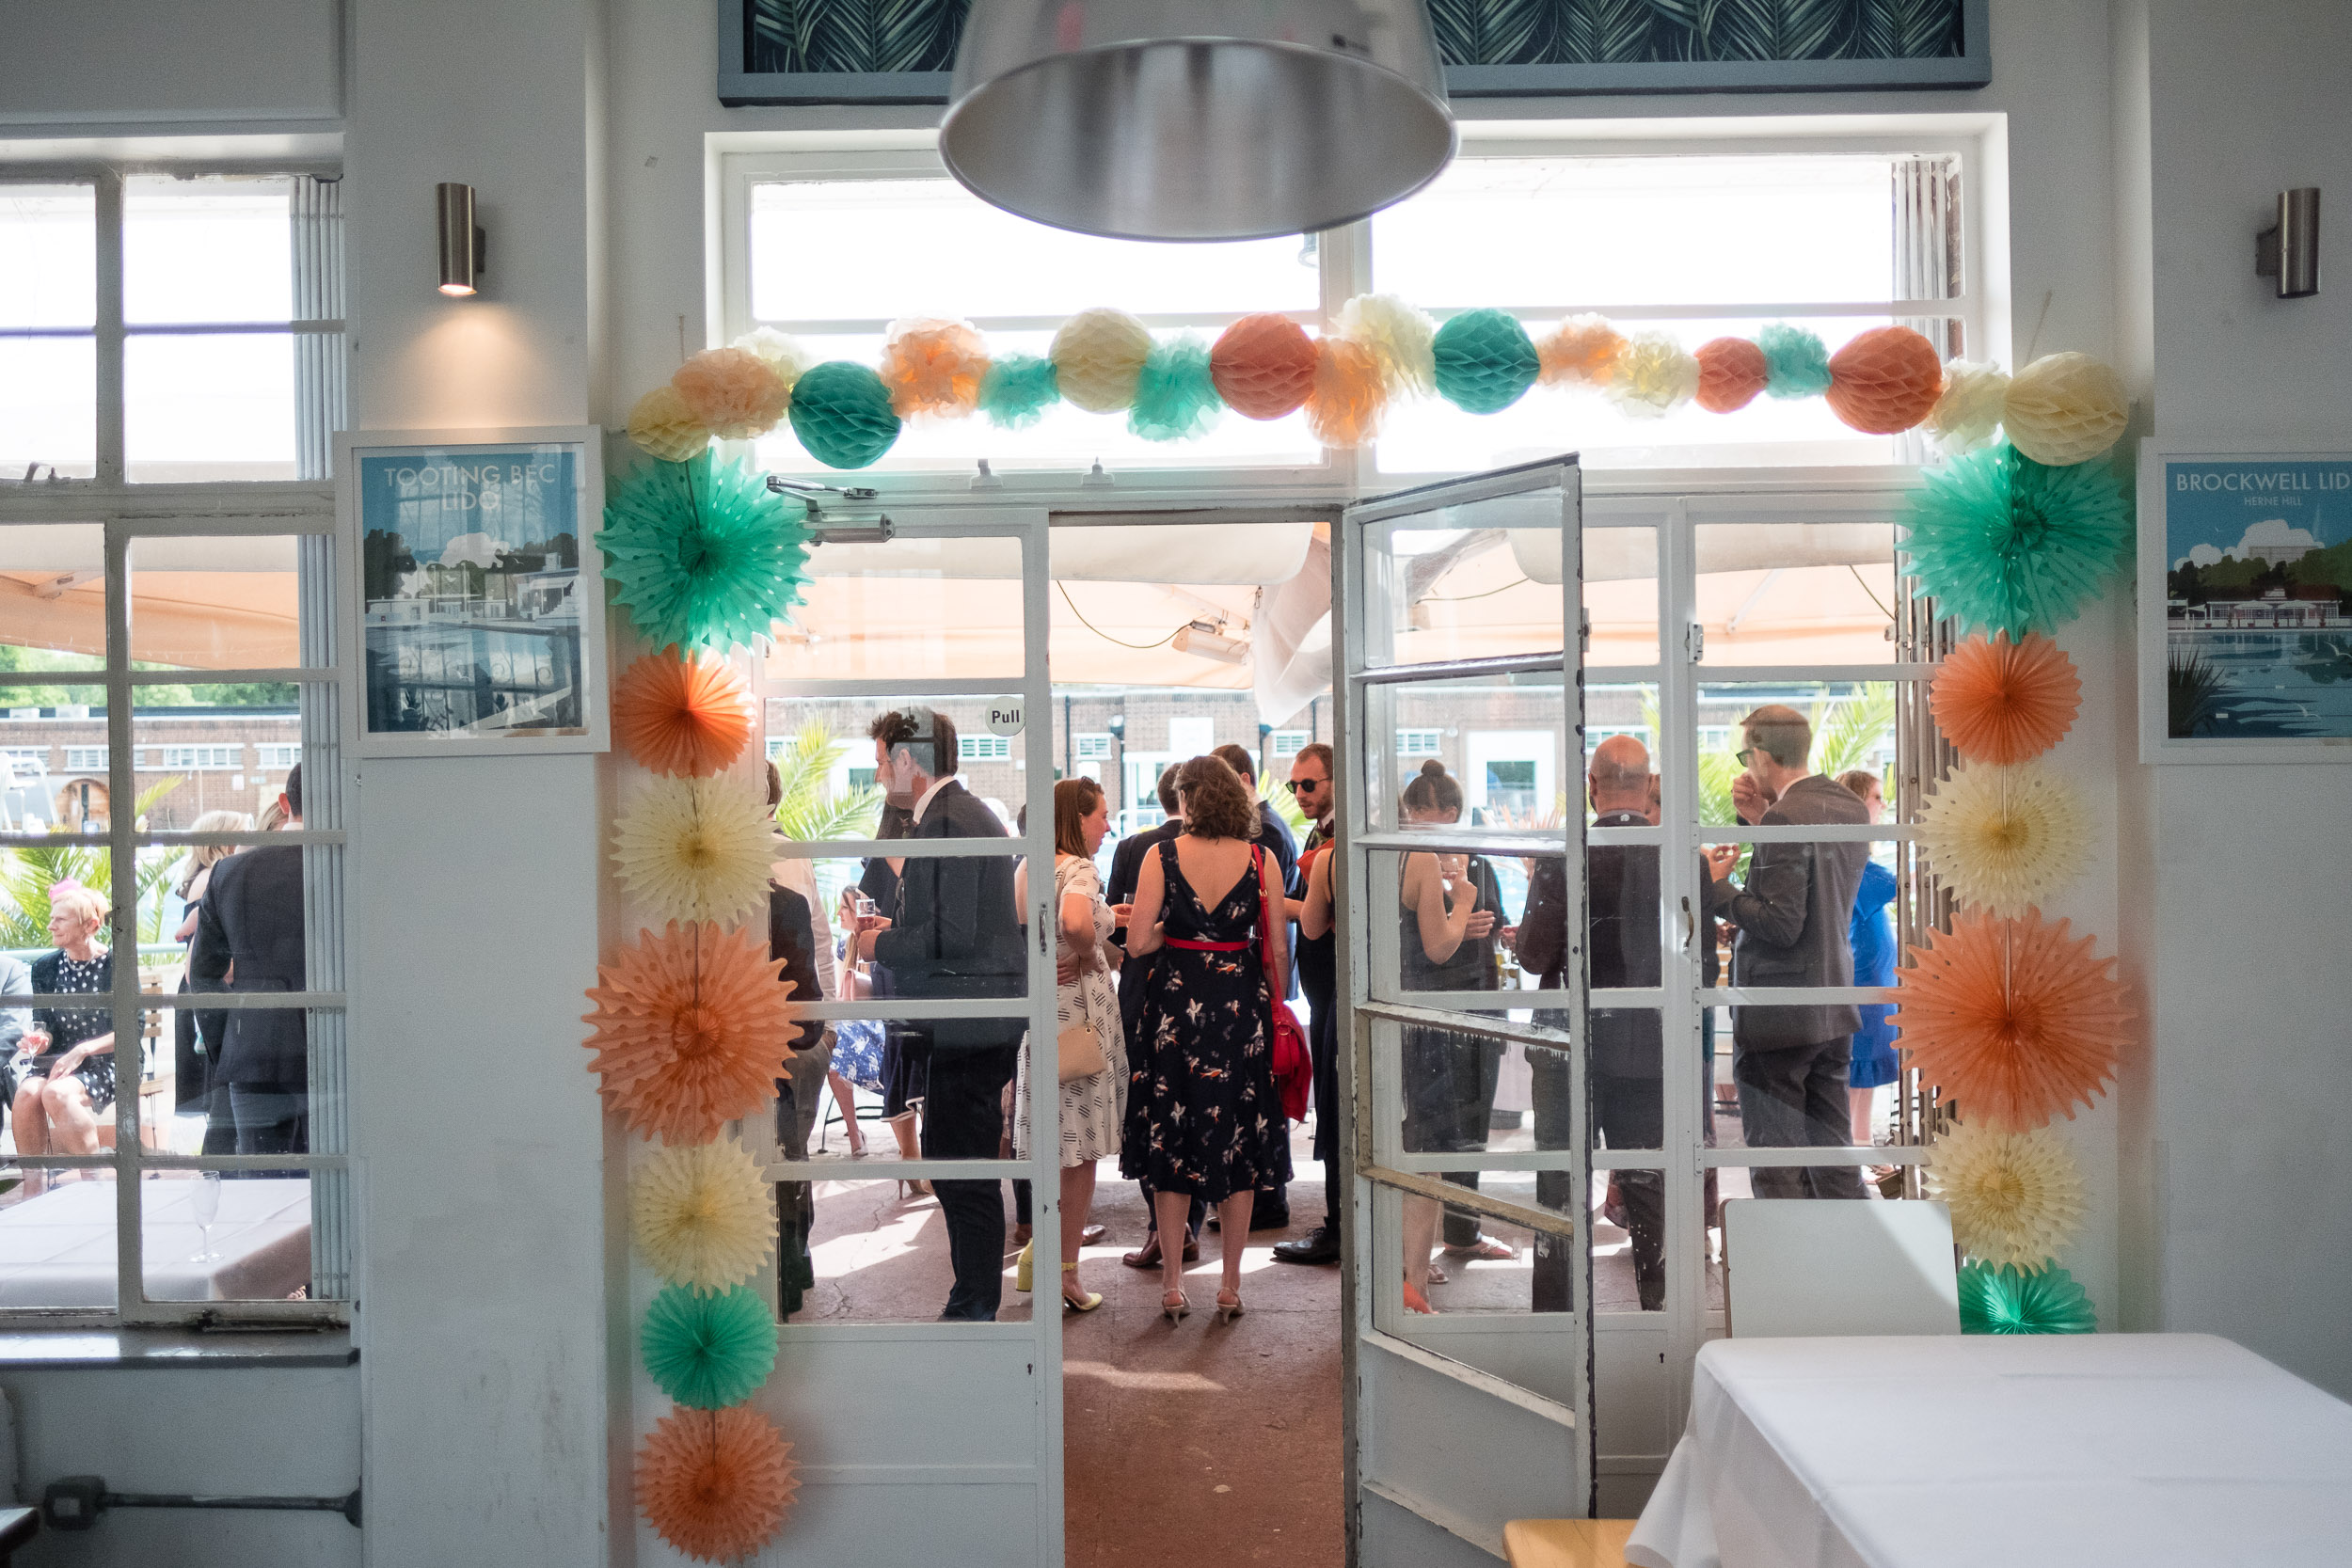 brockwell-lido-brixton-herne-hill-wedding-229.jpg